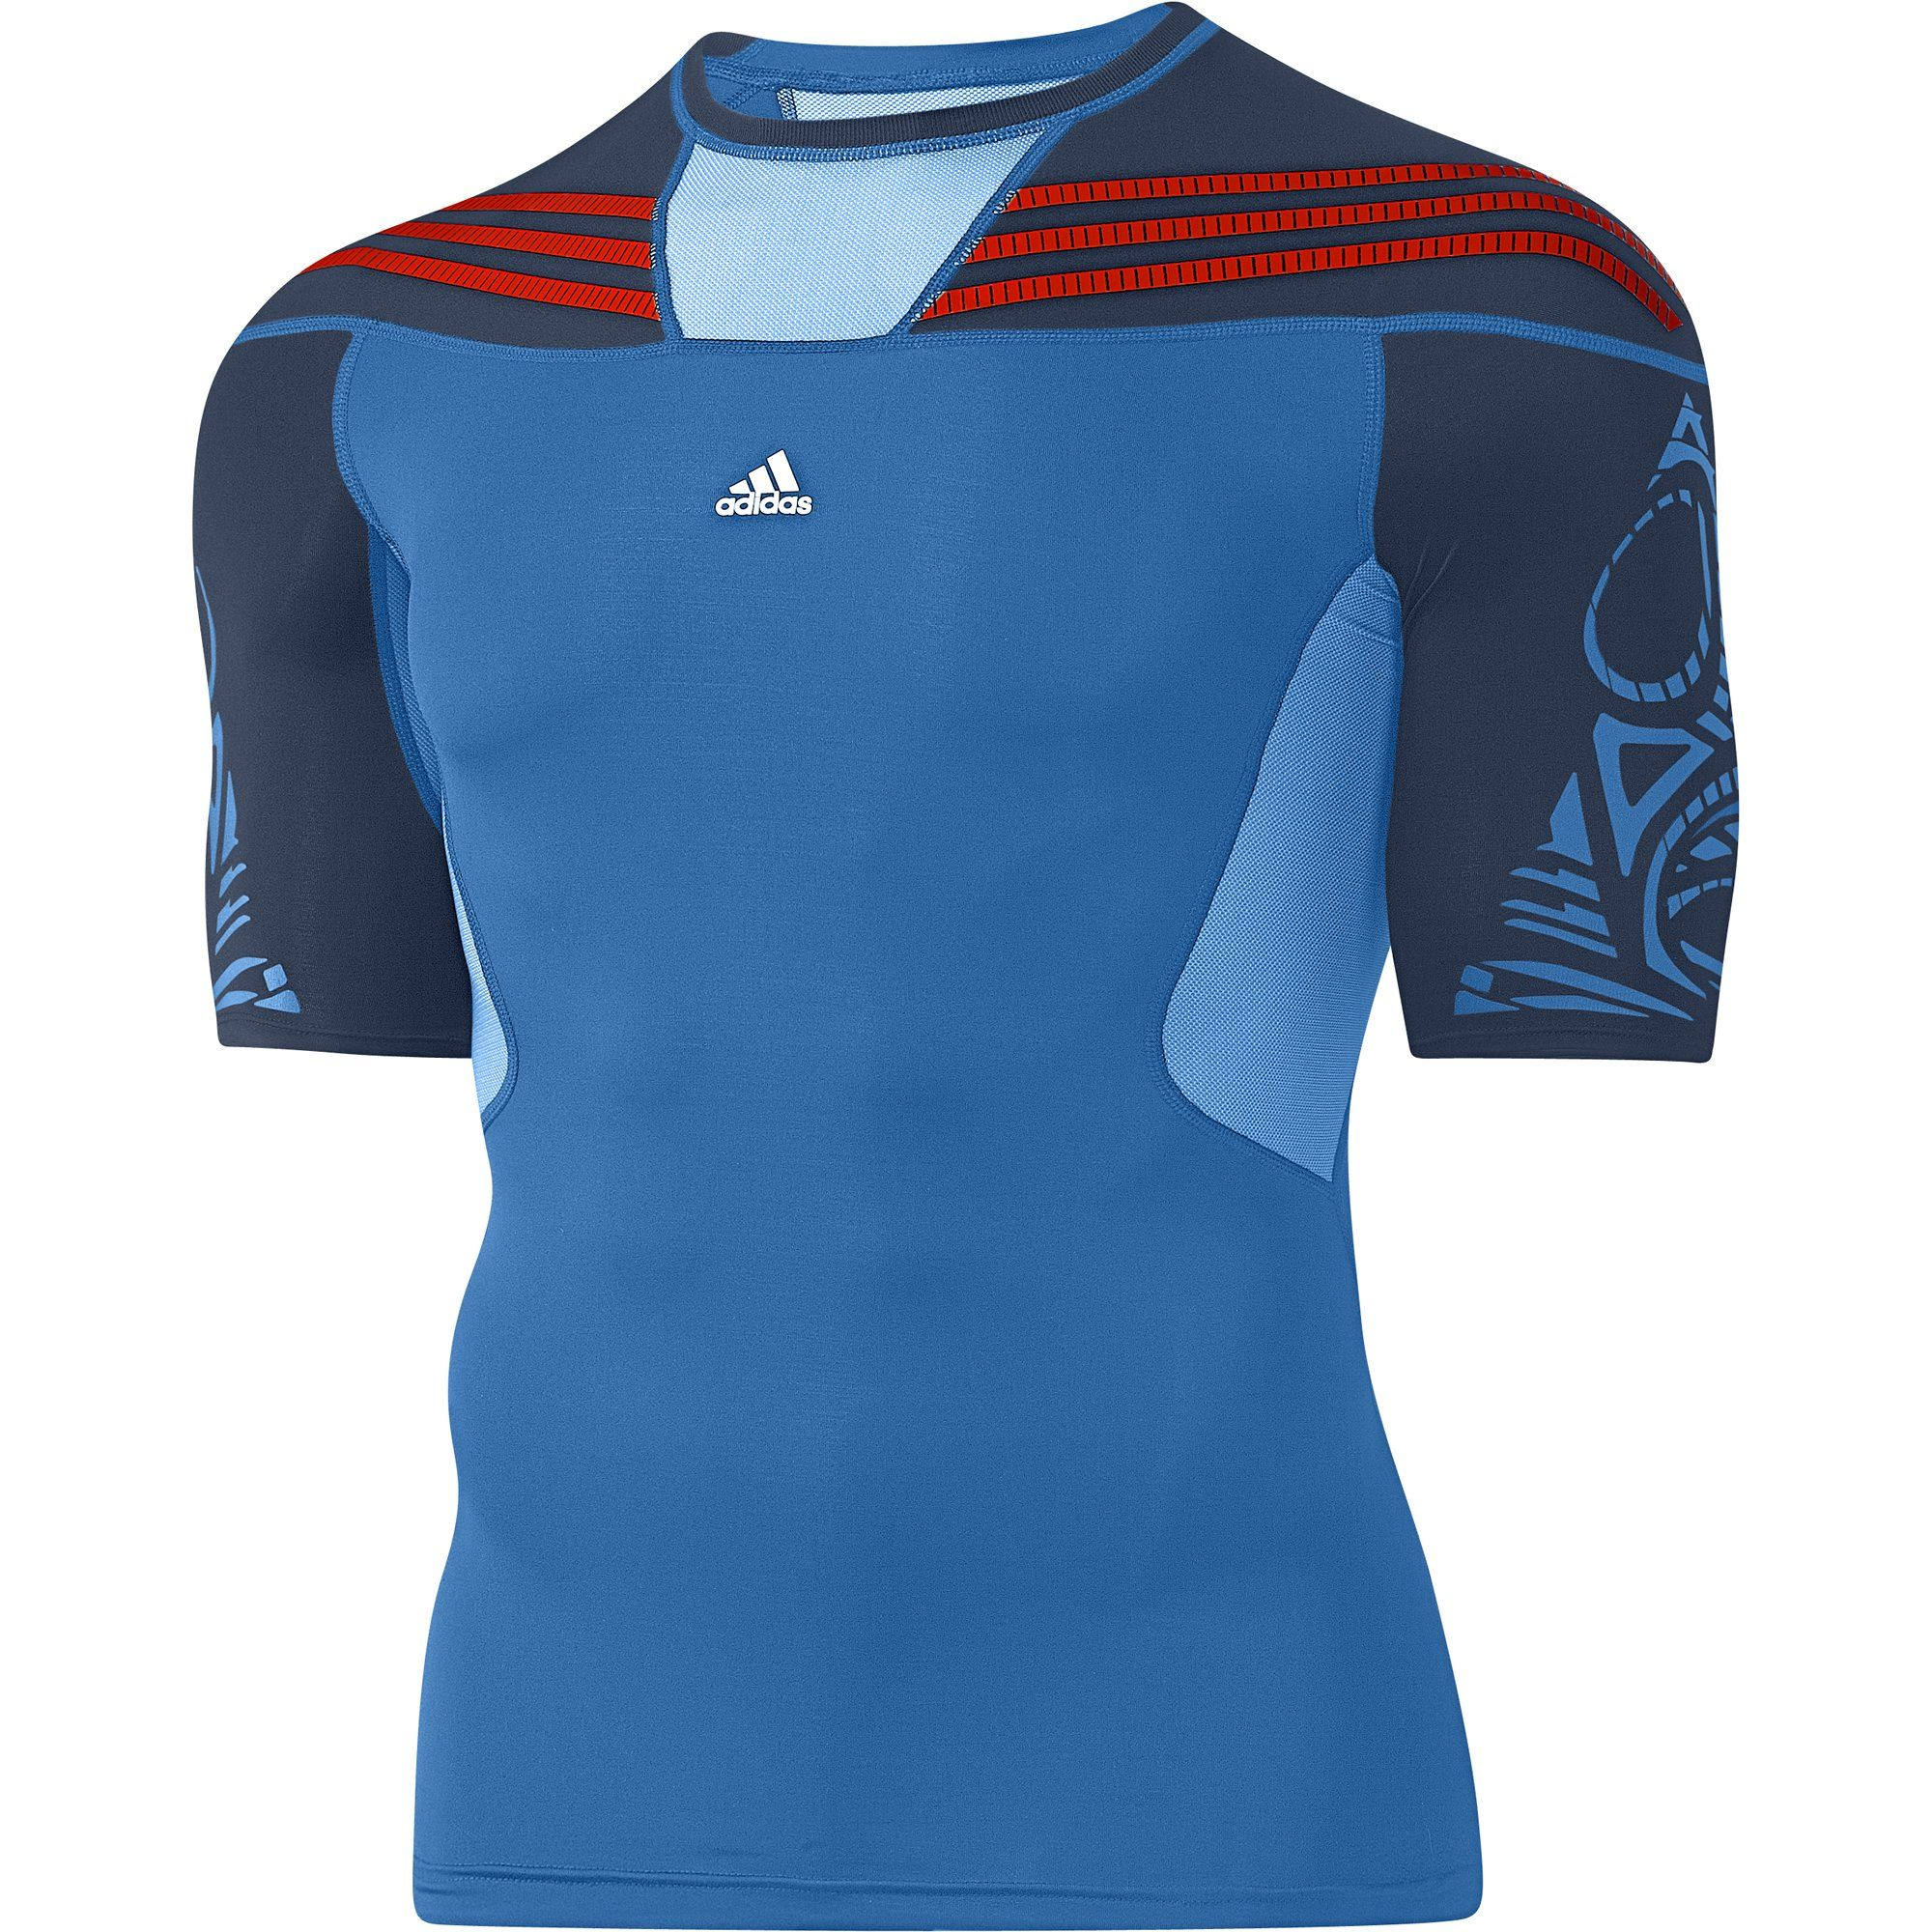 playeras adidas hombre 2016